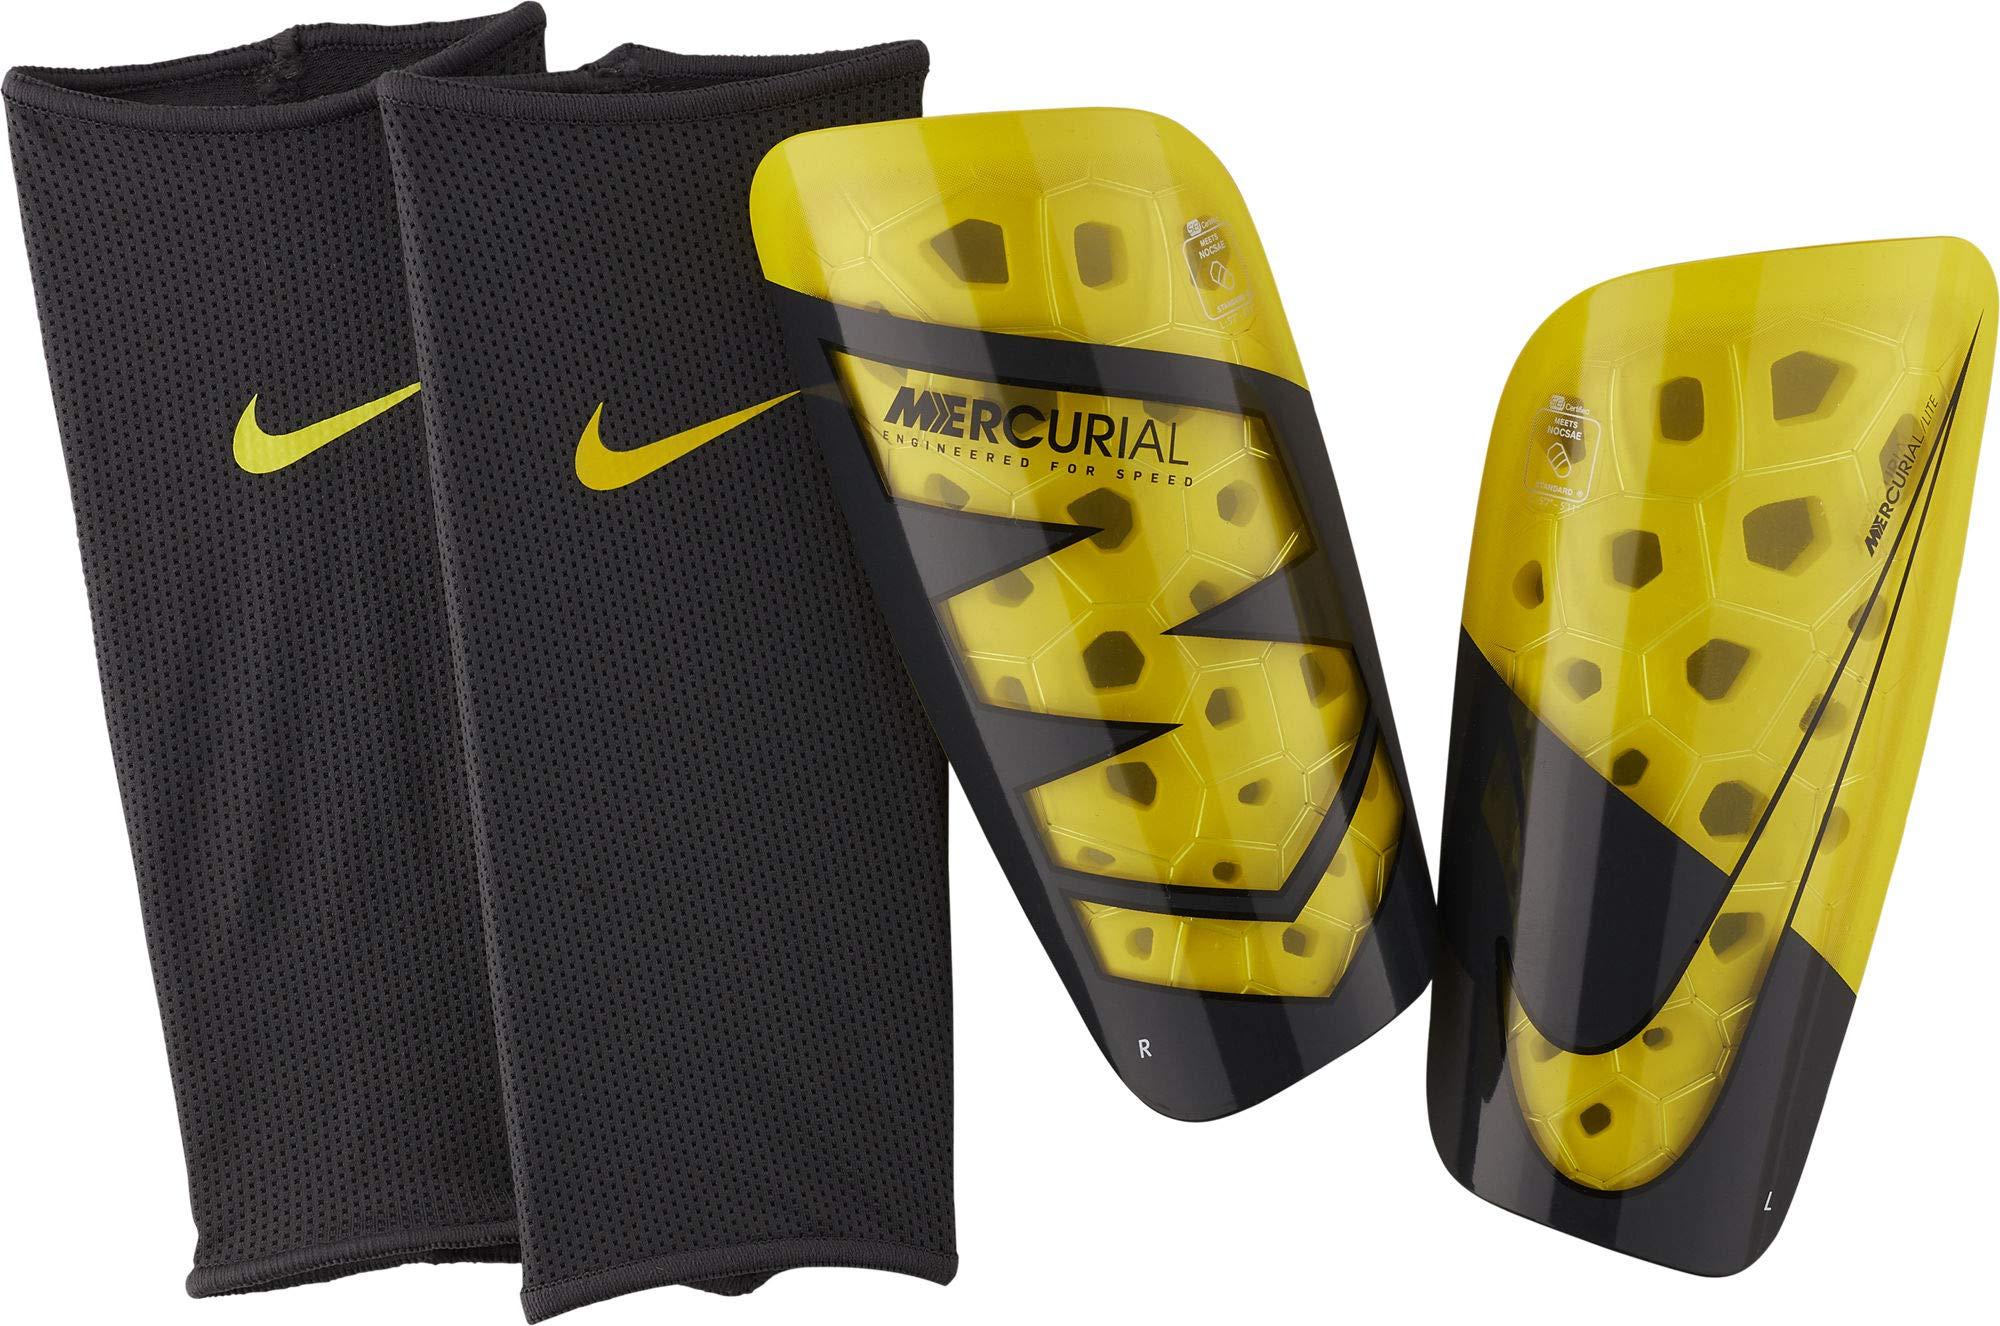 Nike Mercurial Lite Soccer Shin Guards Volt/Black by Nike